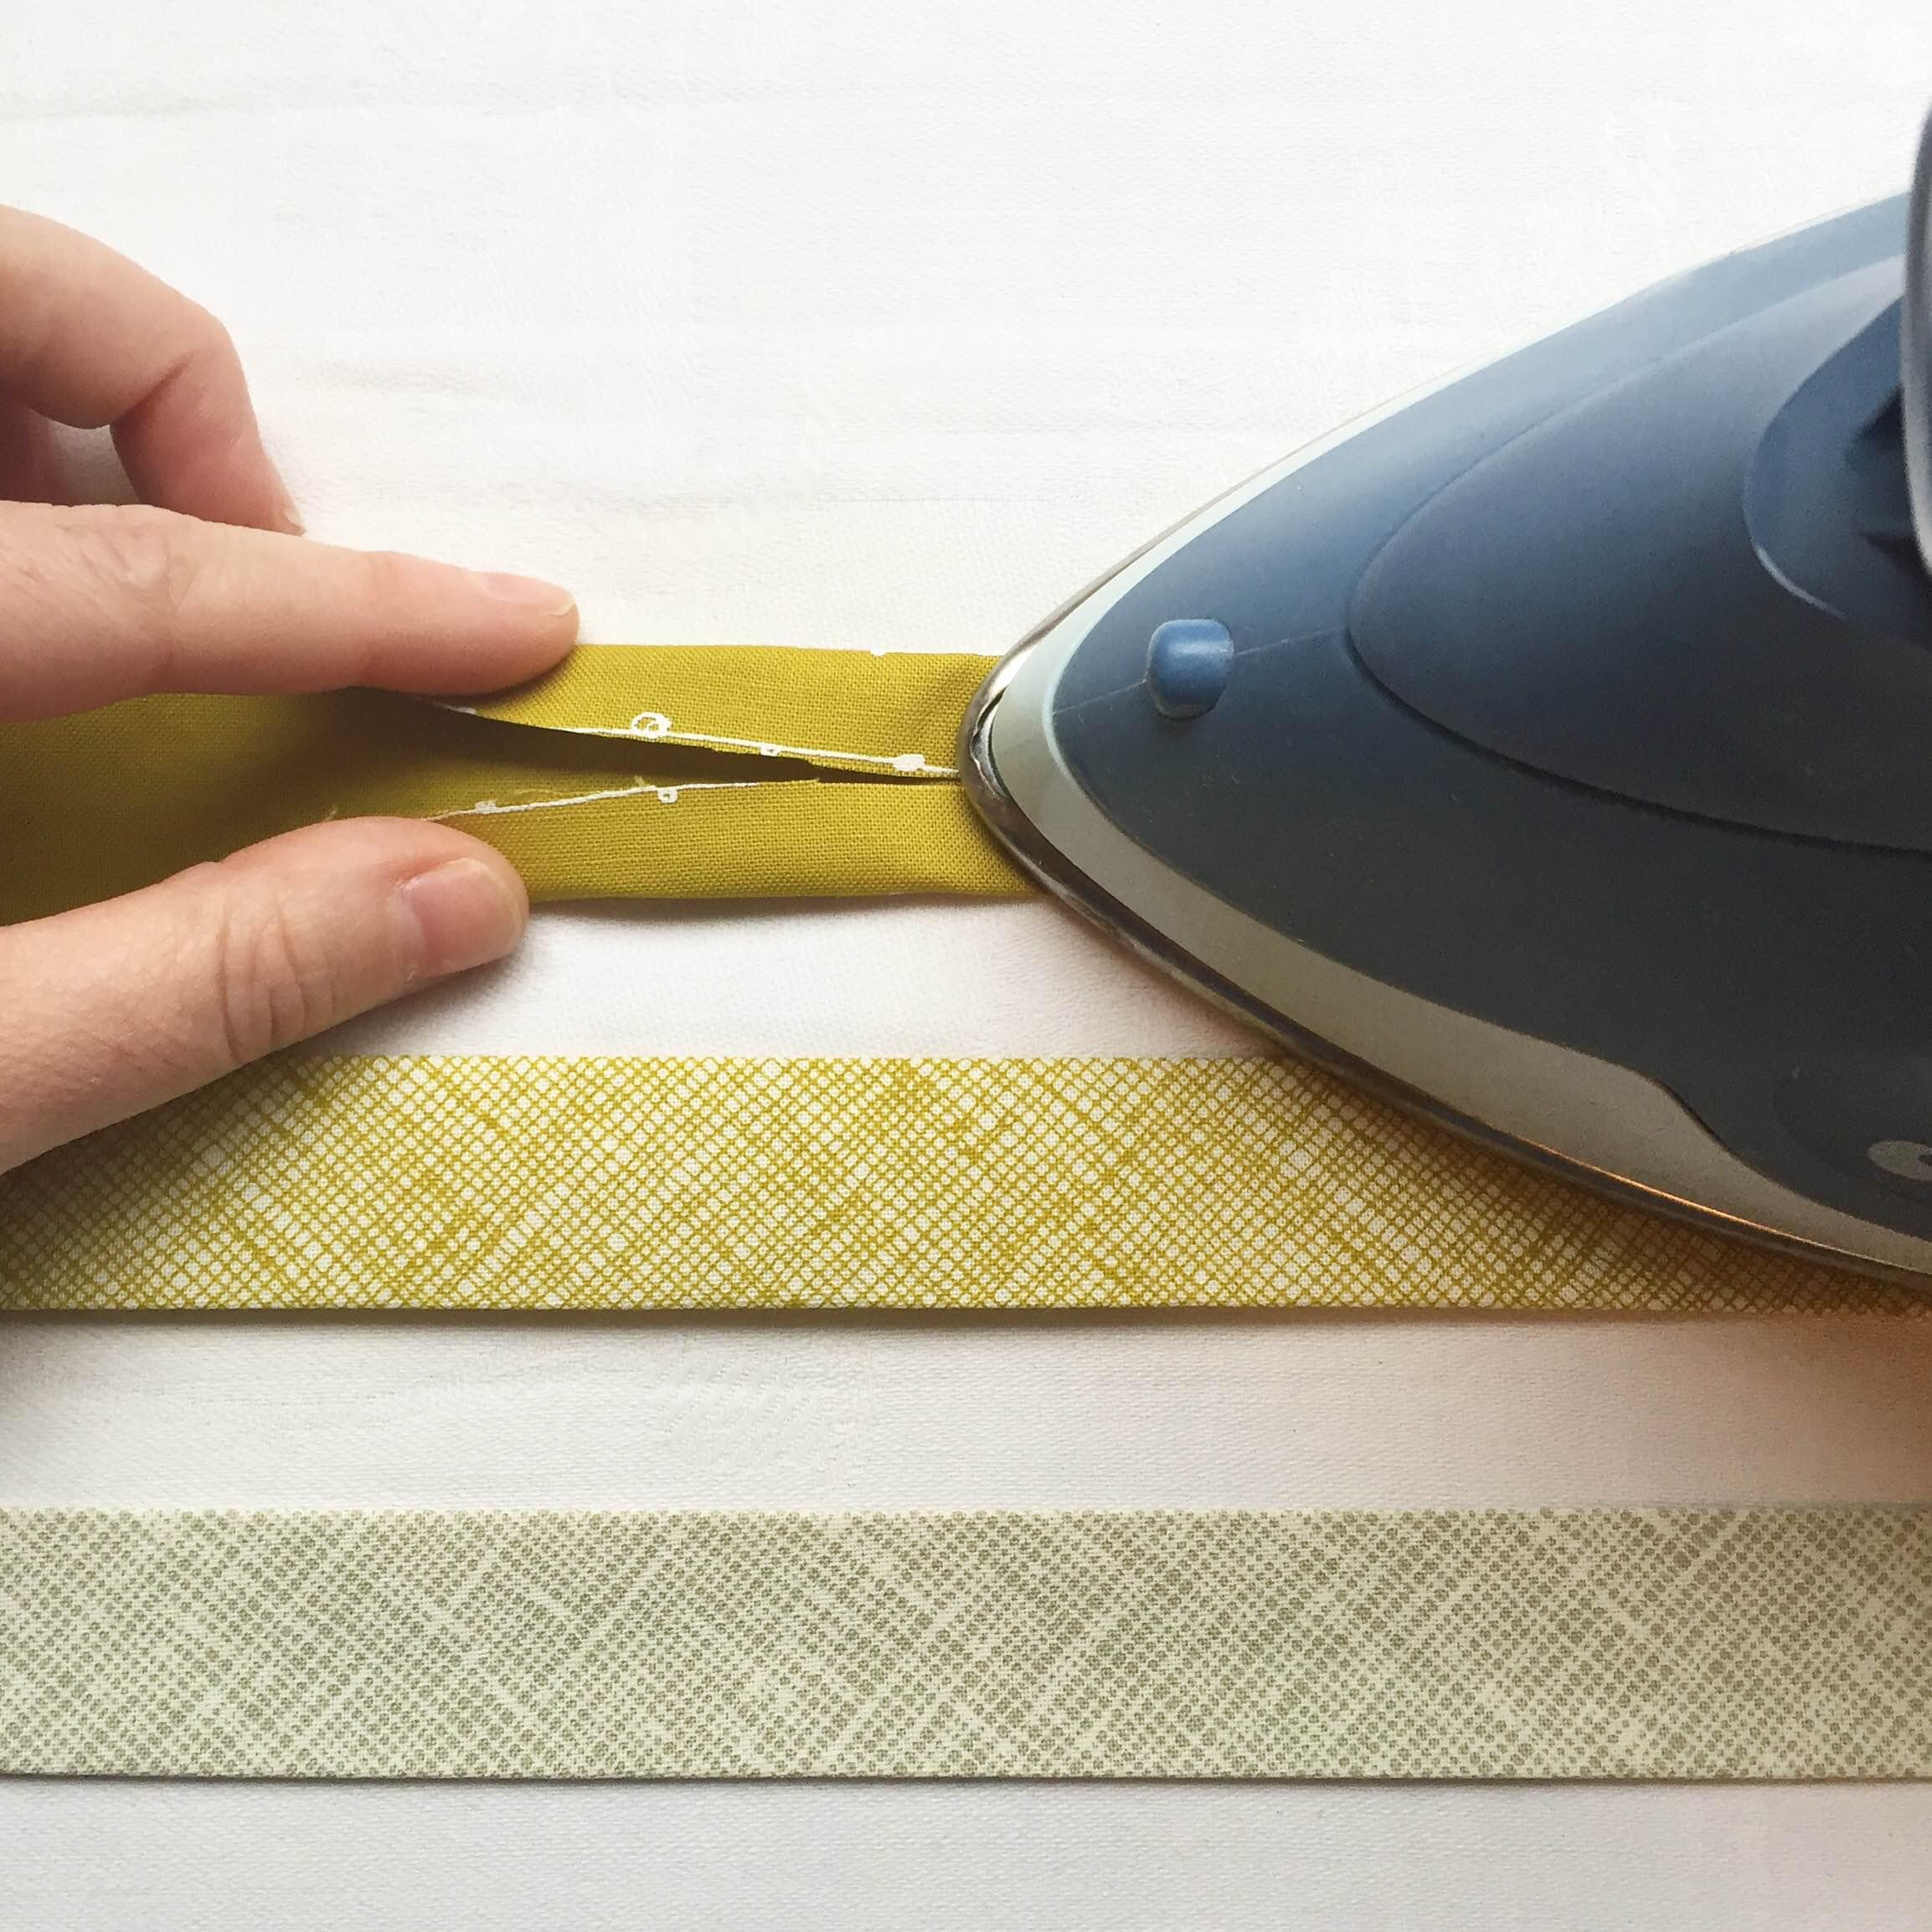 WEFTY Weaving - Prepping Strips for Weaving